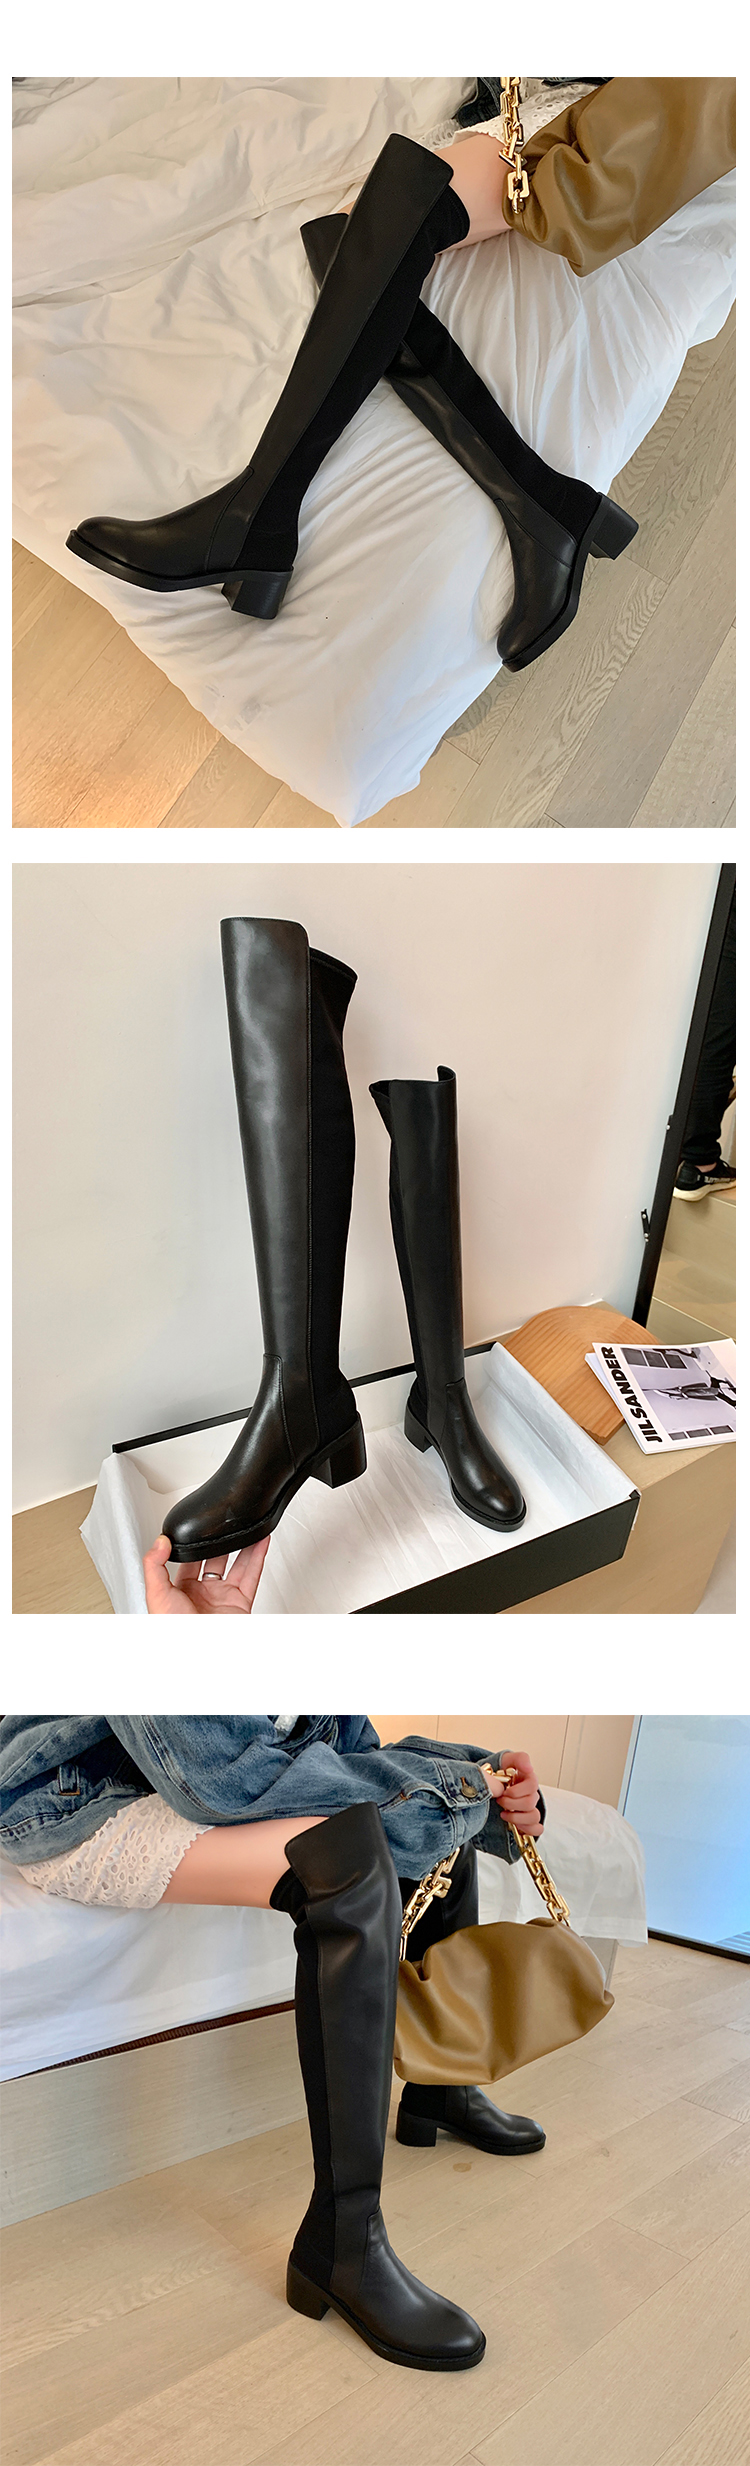 22-24.5cm microfibra elástico boot shaft + couro